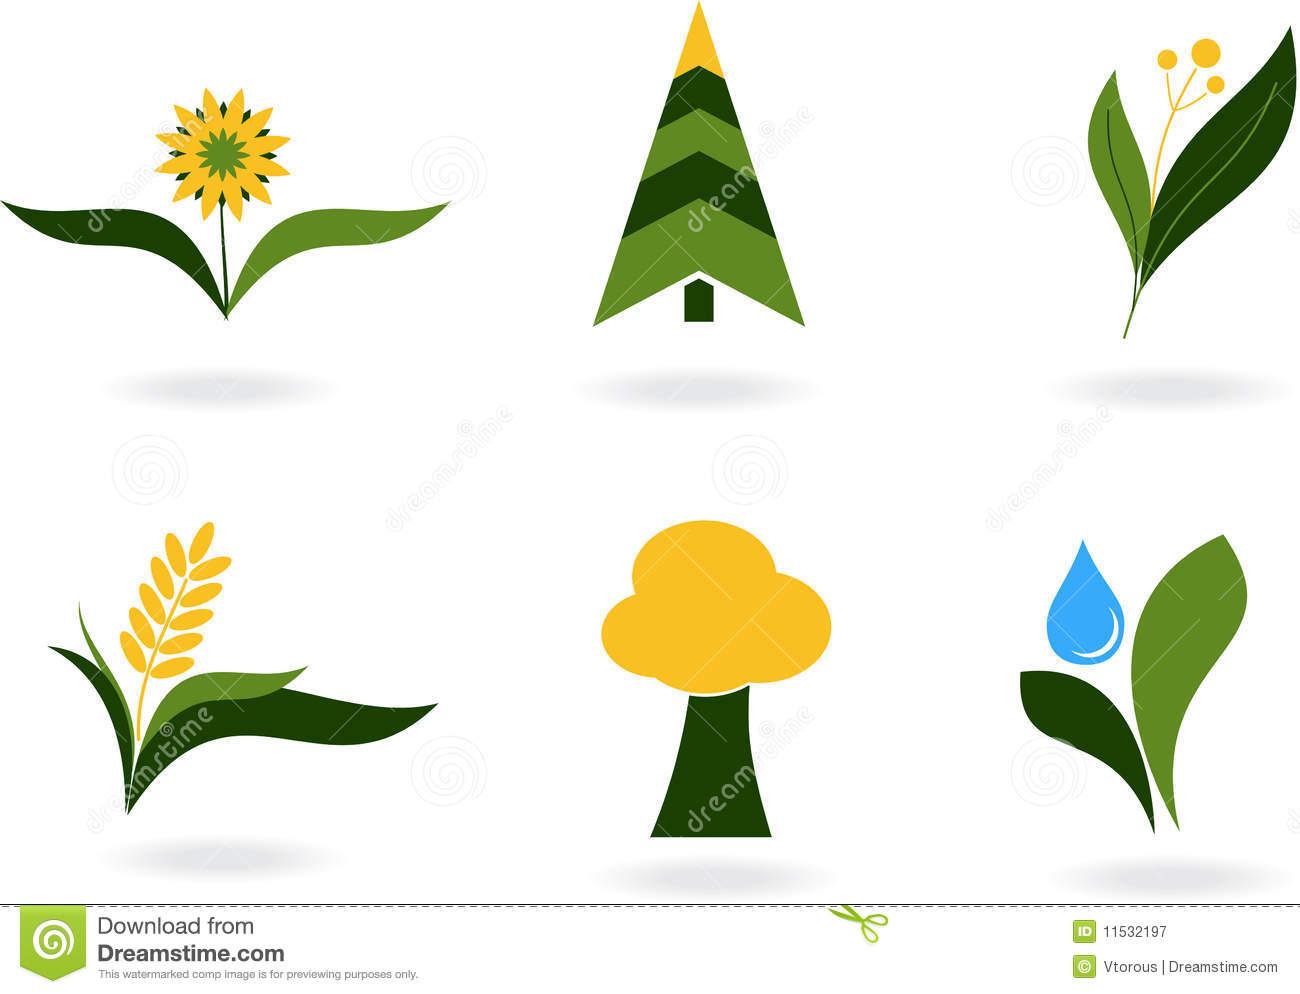 Plant Icons Free